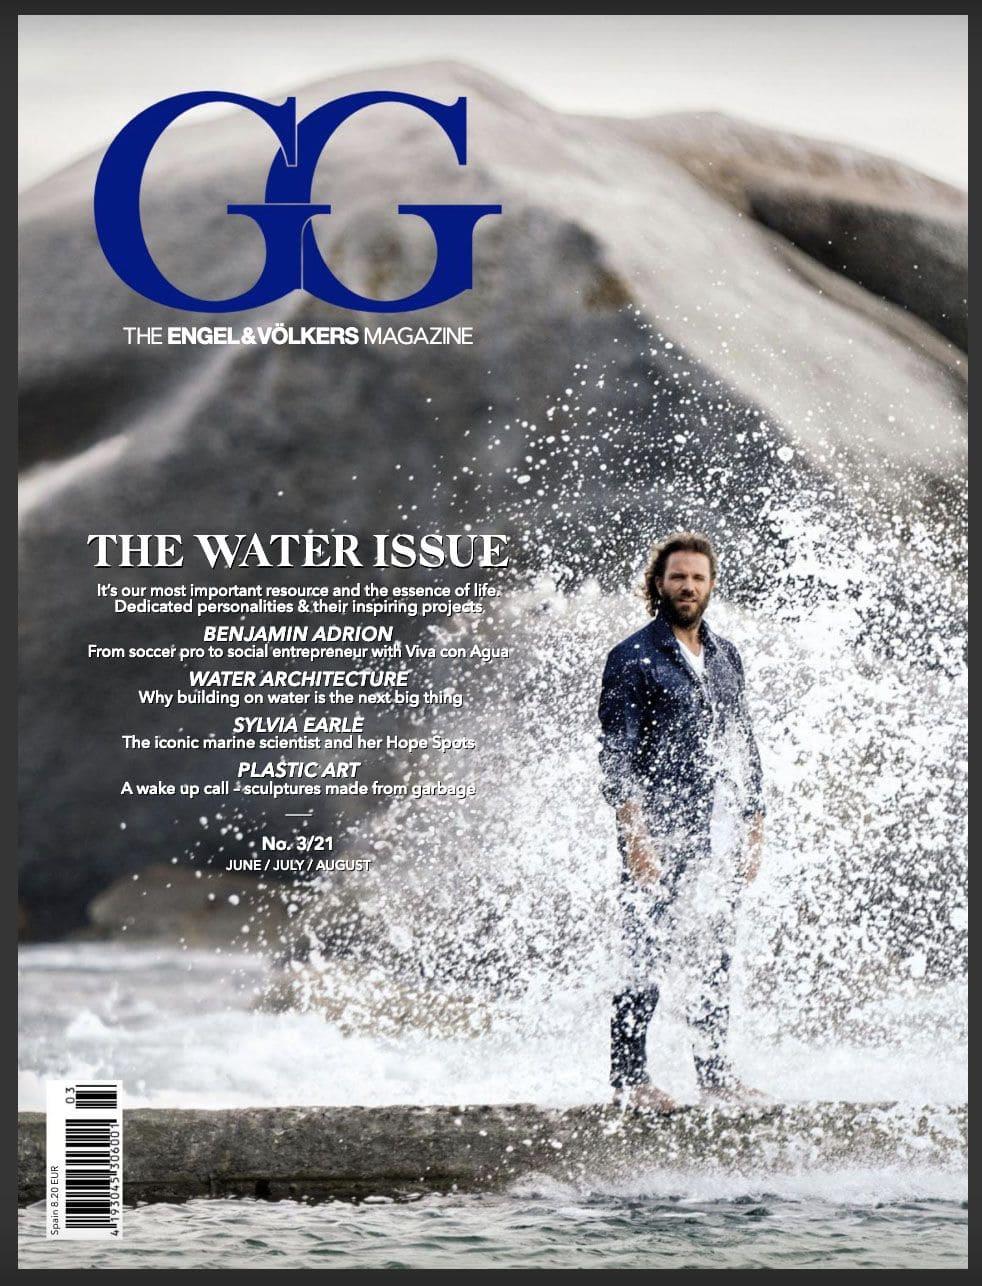 portada GG magazine engel & volkers xisco fuster fotografo